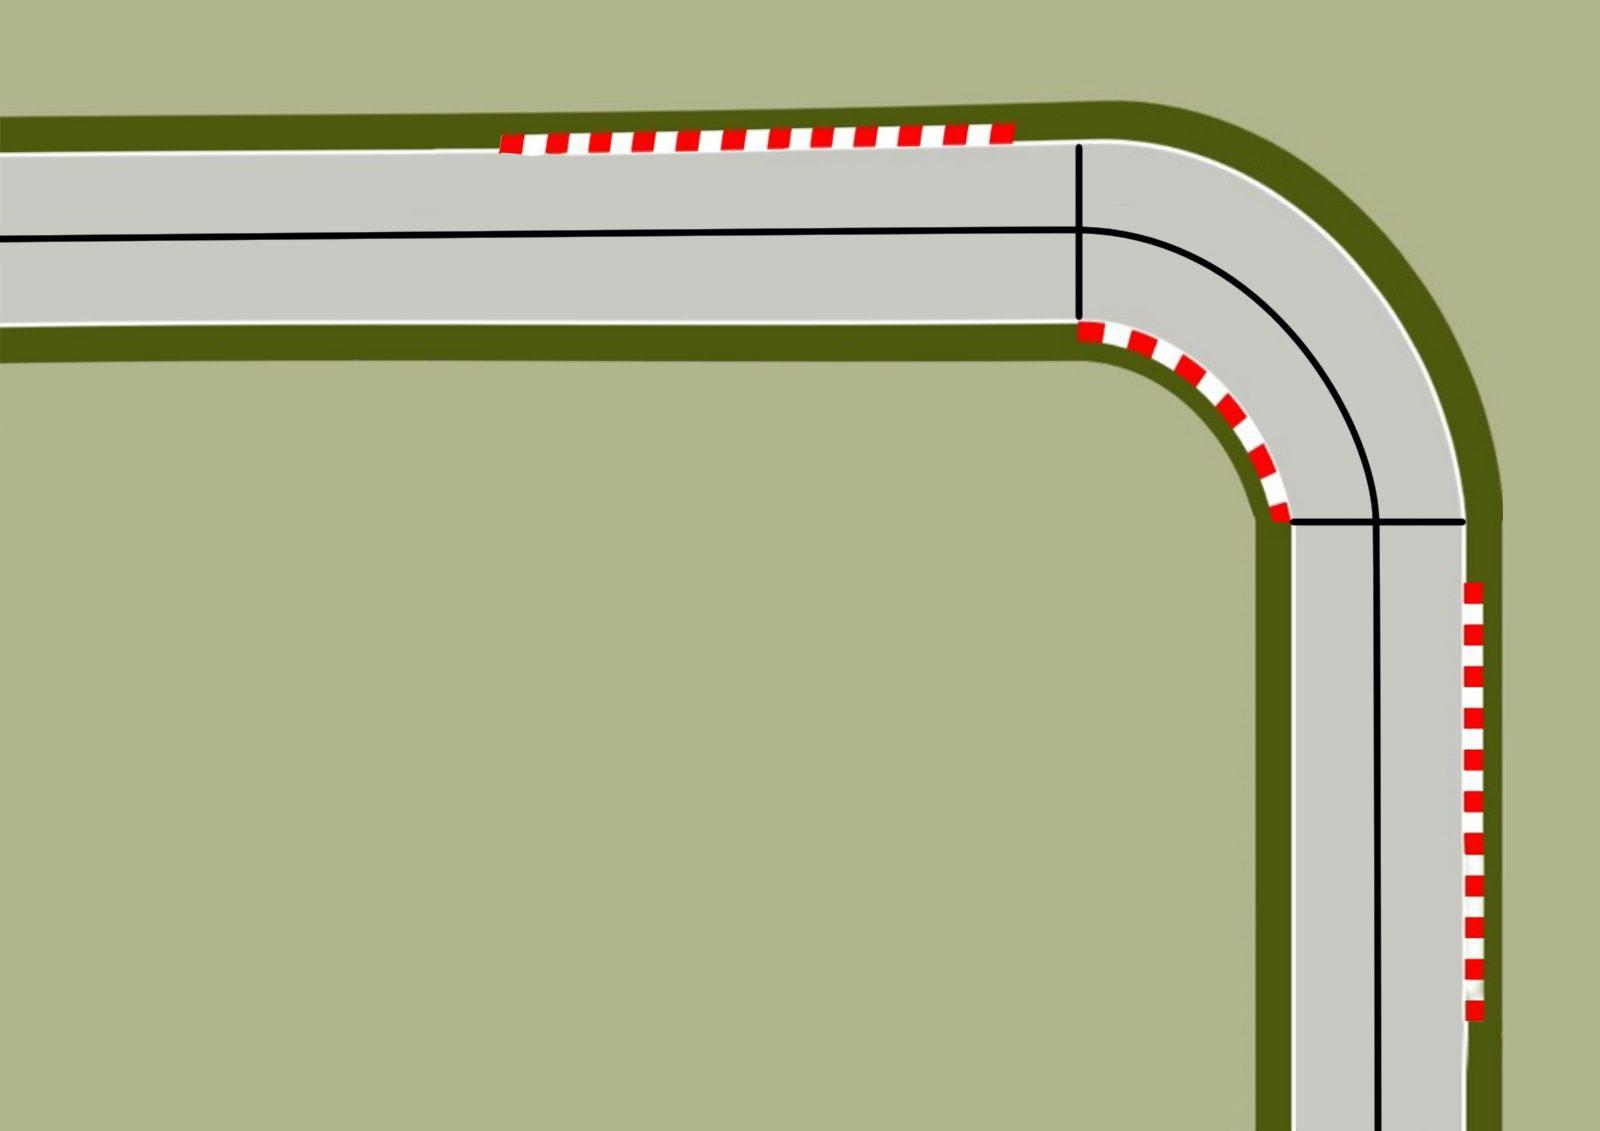 Geometria de una curva